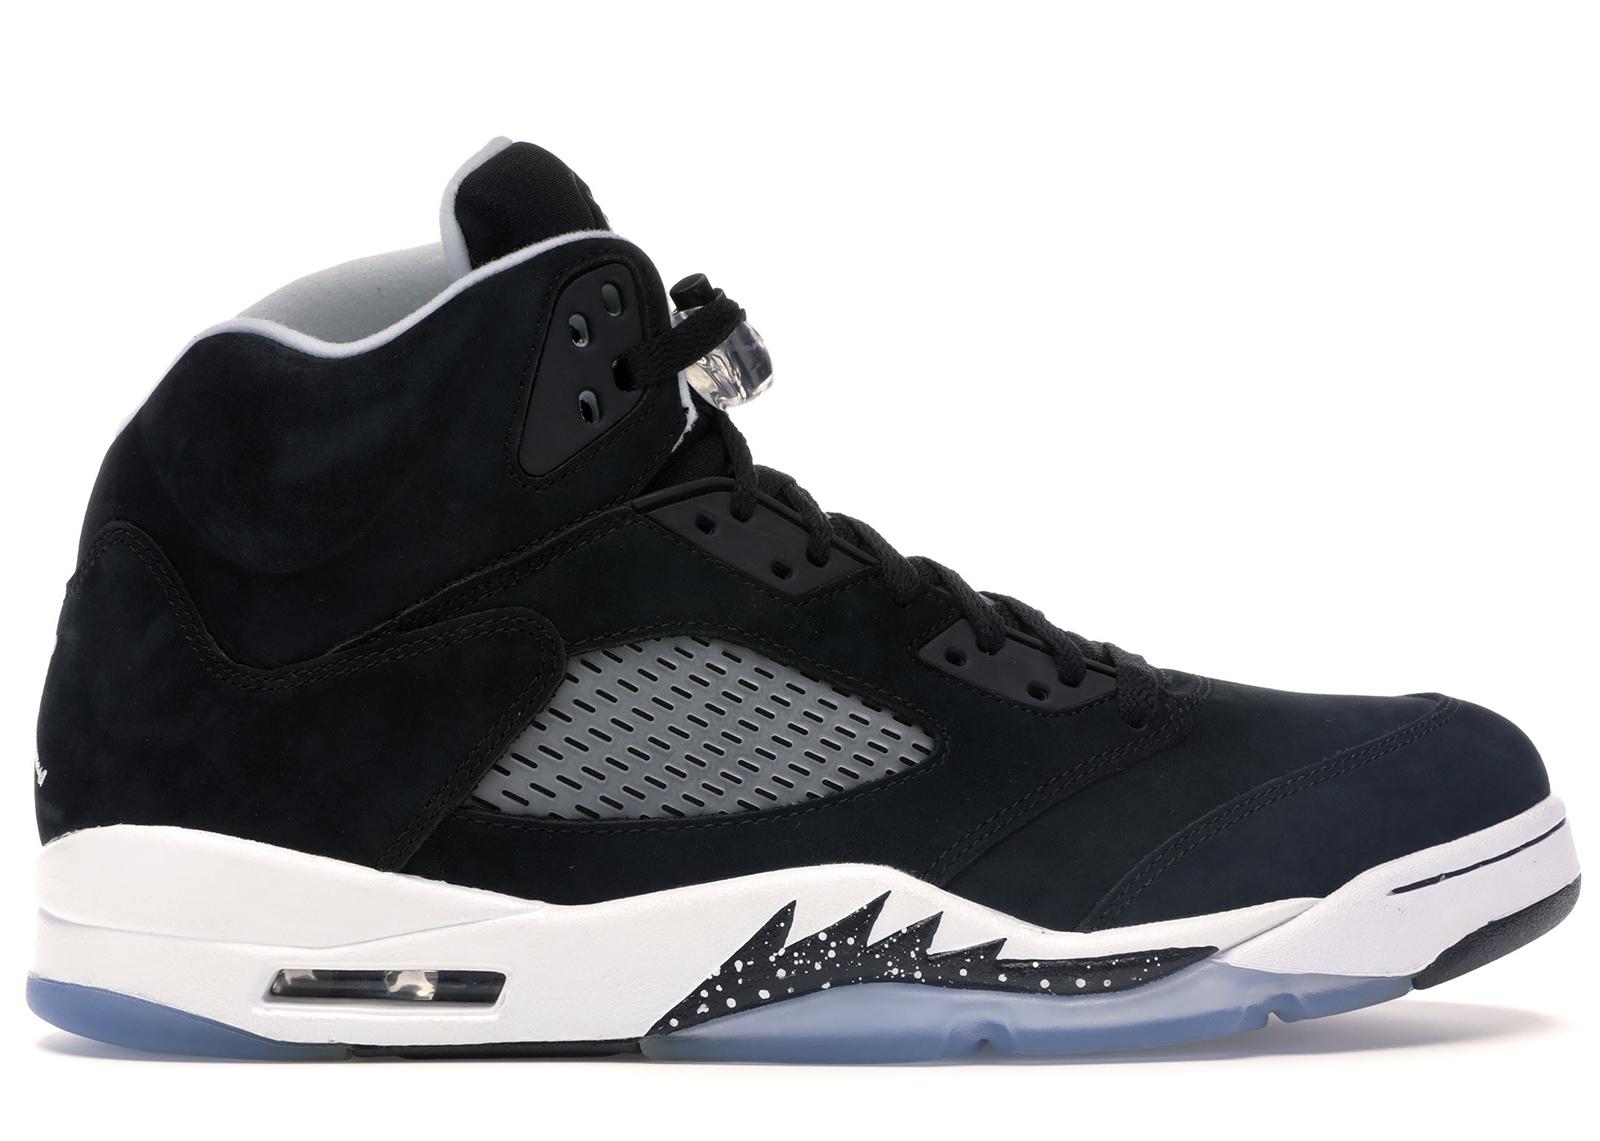 Nike Herren Air Jordan 5 Retro Niedrige Sneaker, Black, Cool